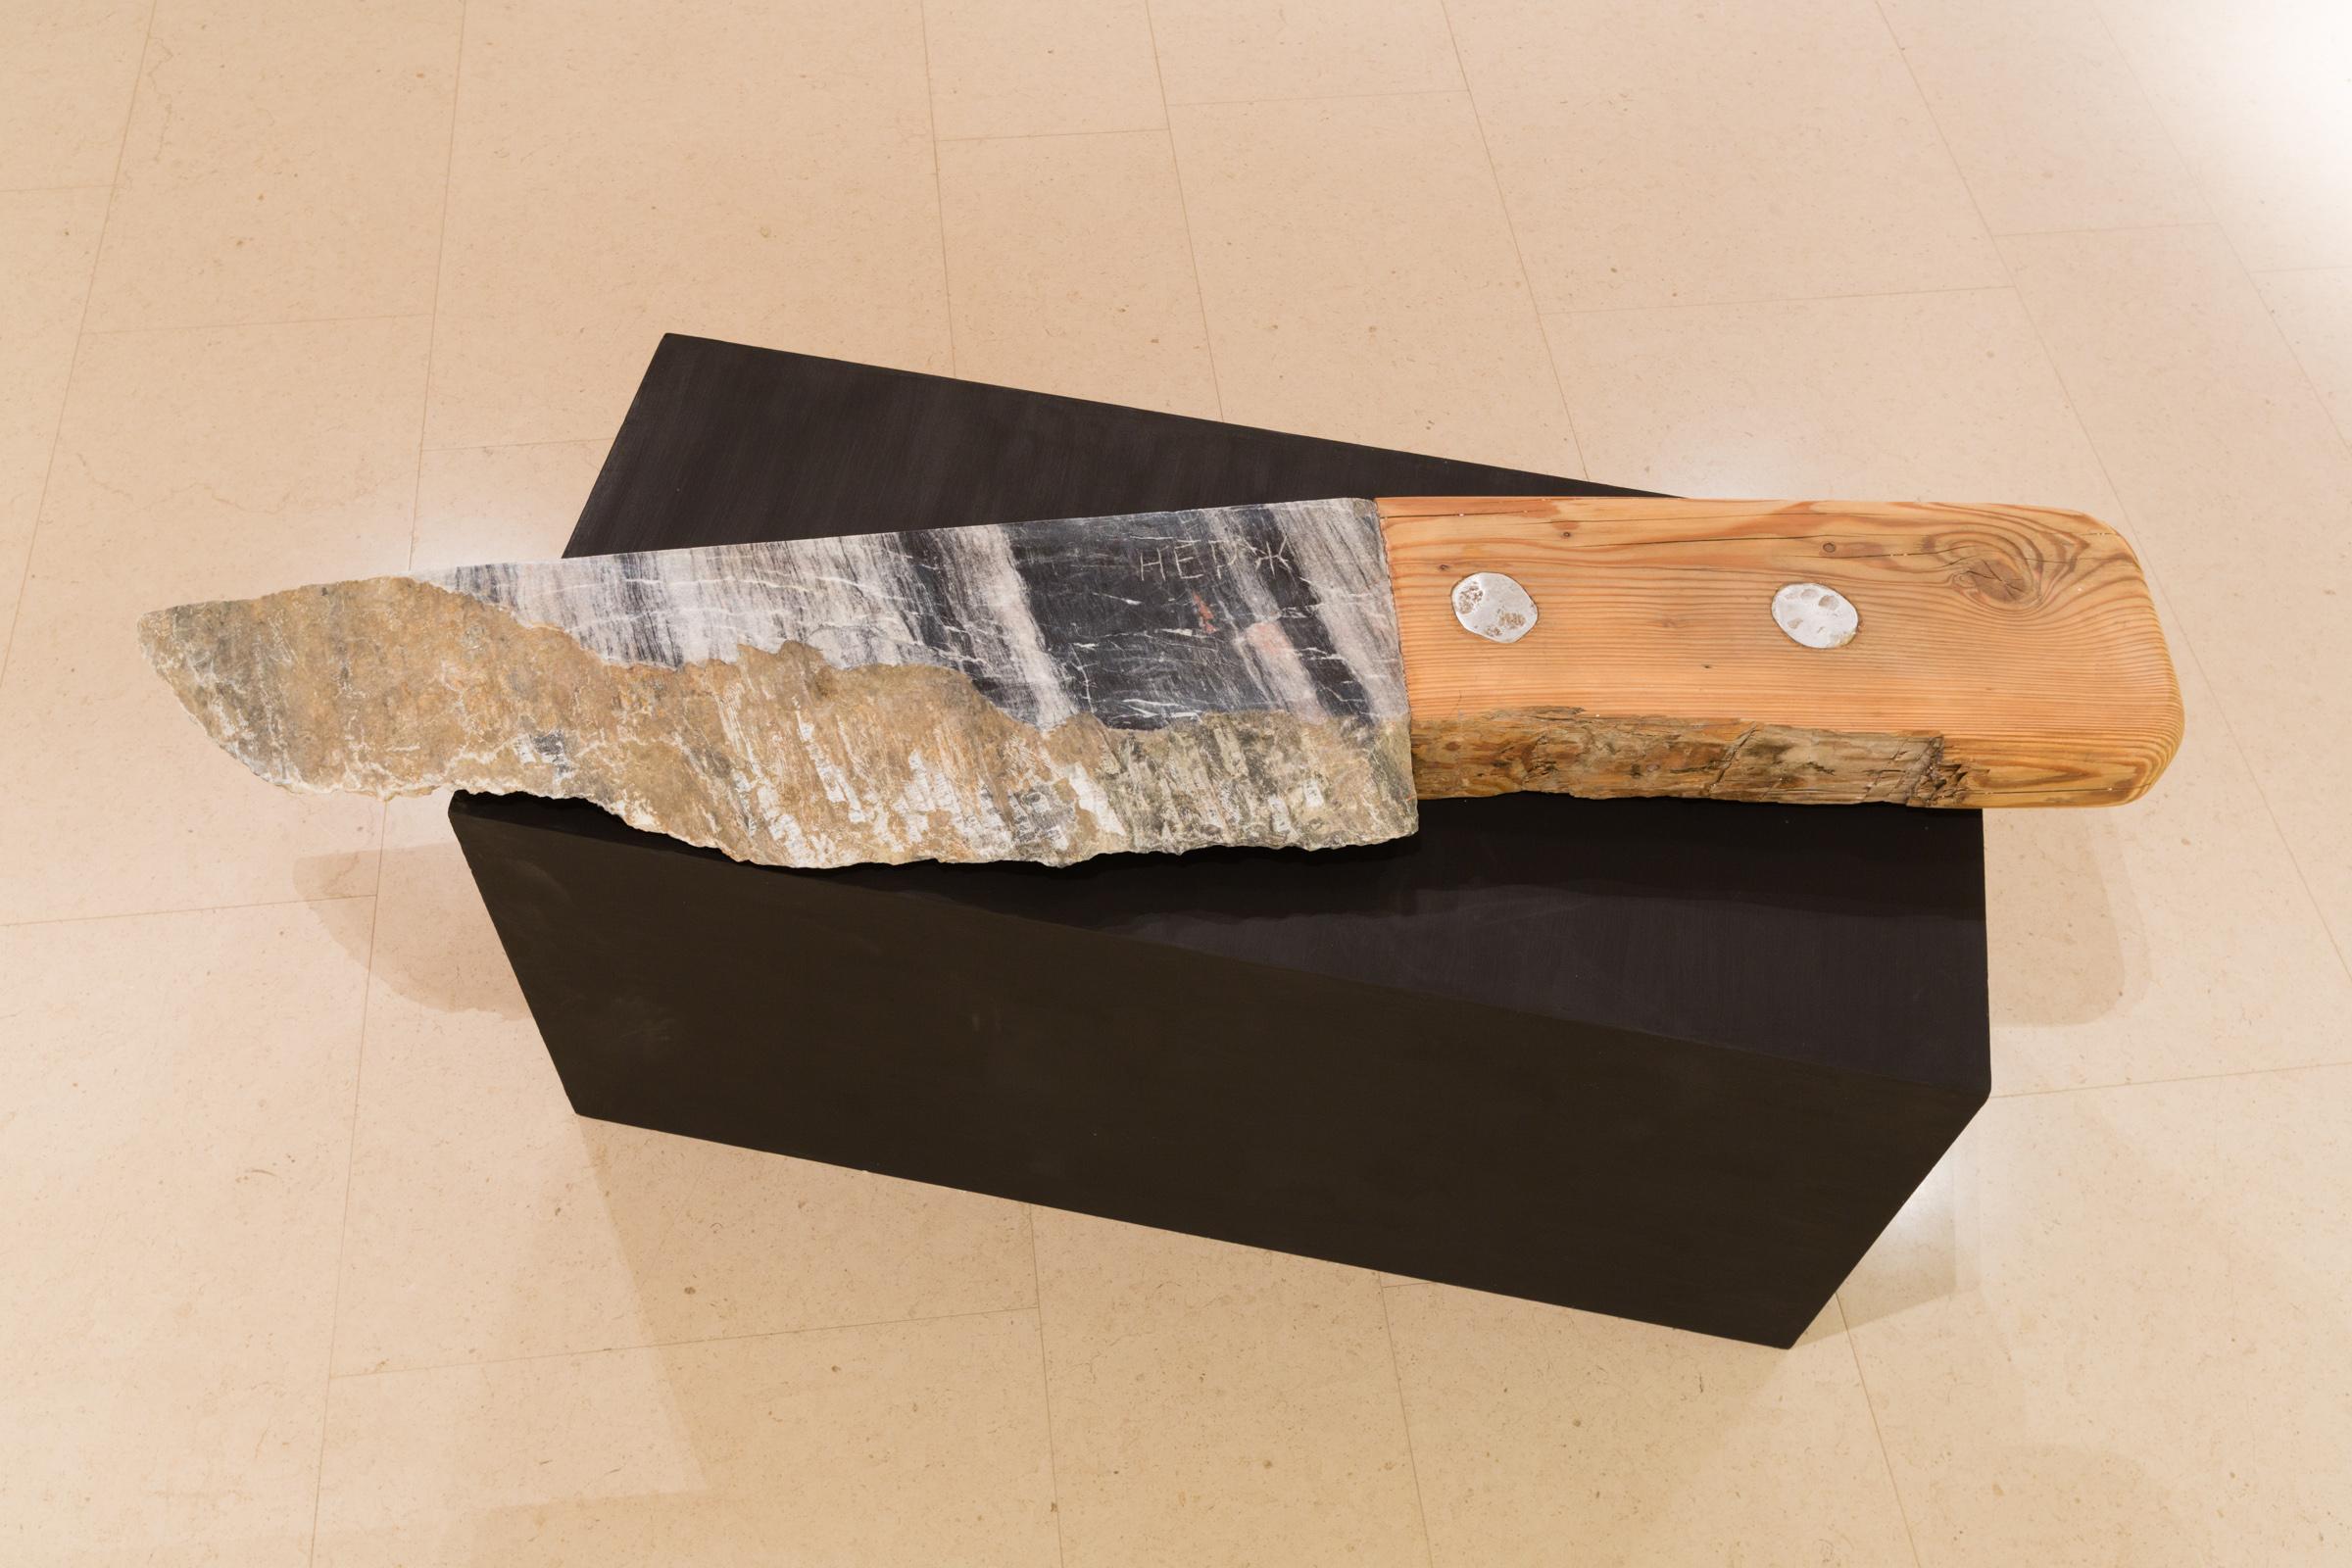 Yelena and Viktor Vorobyev, Knife, 2003, stone and wood